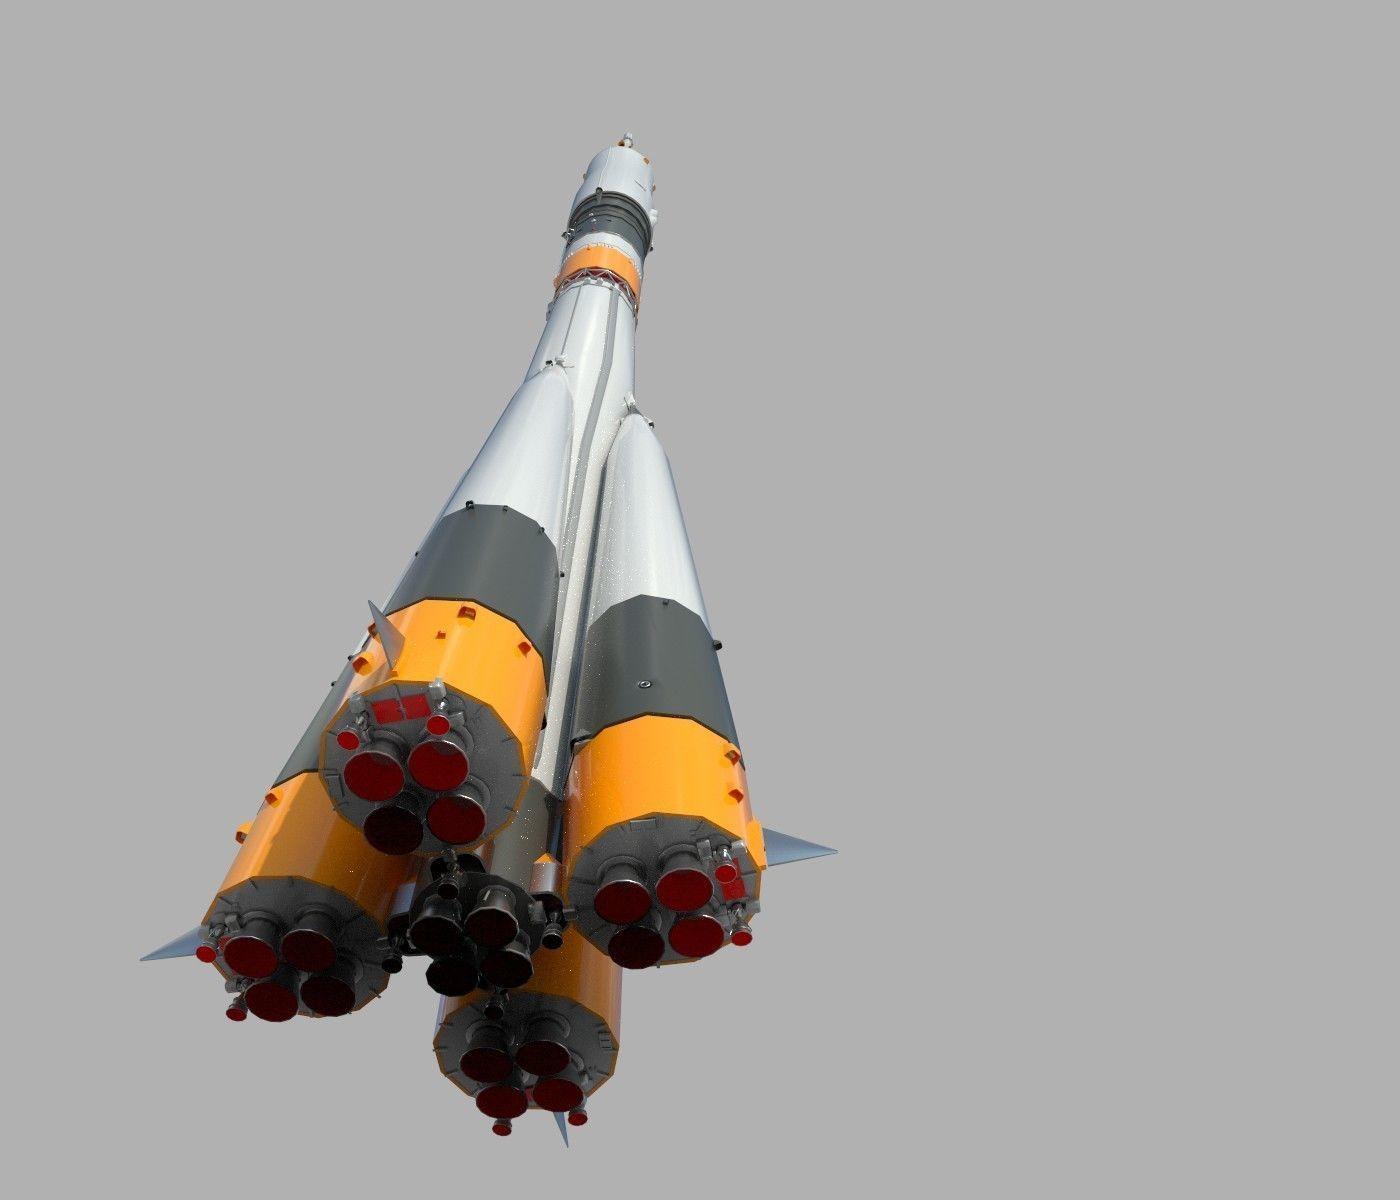 Baikonur rocket PBR